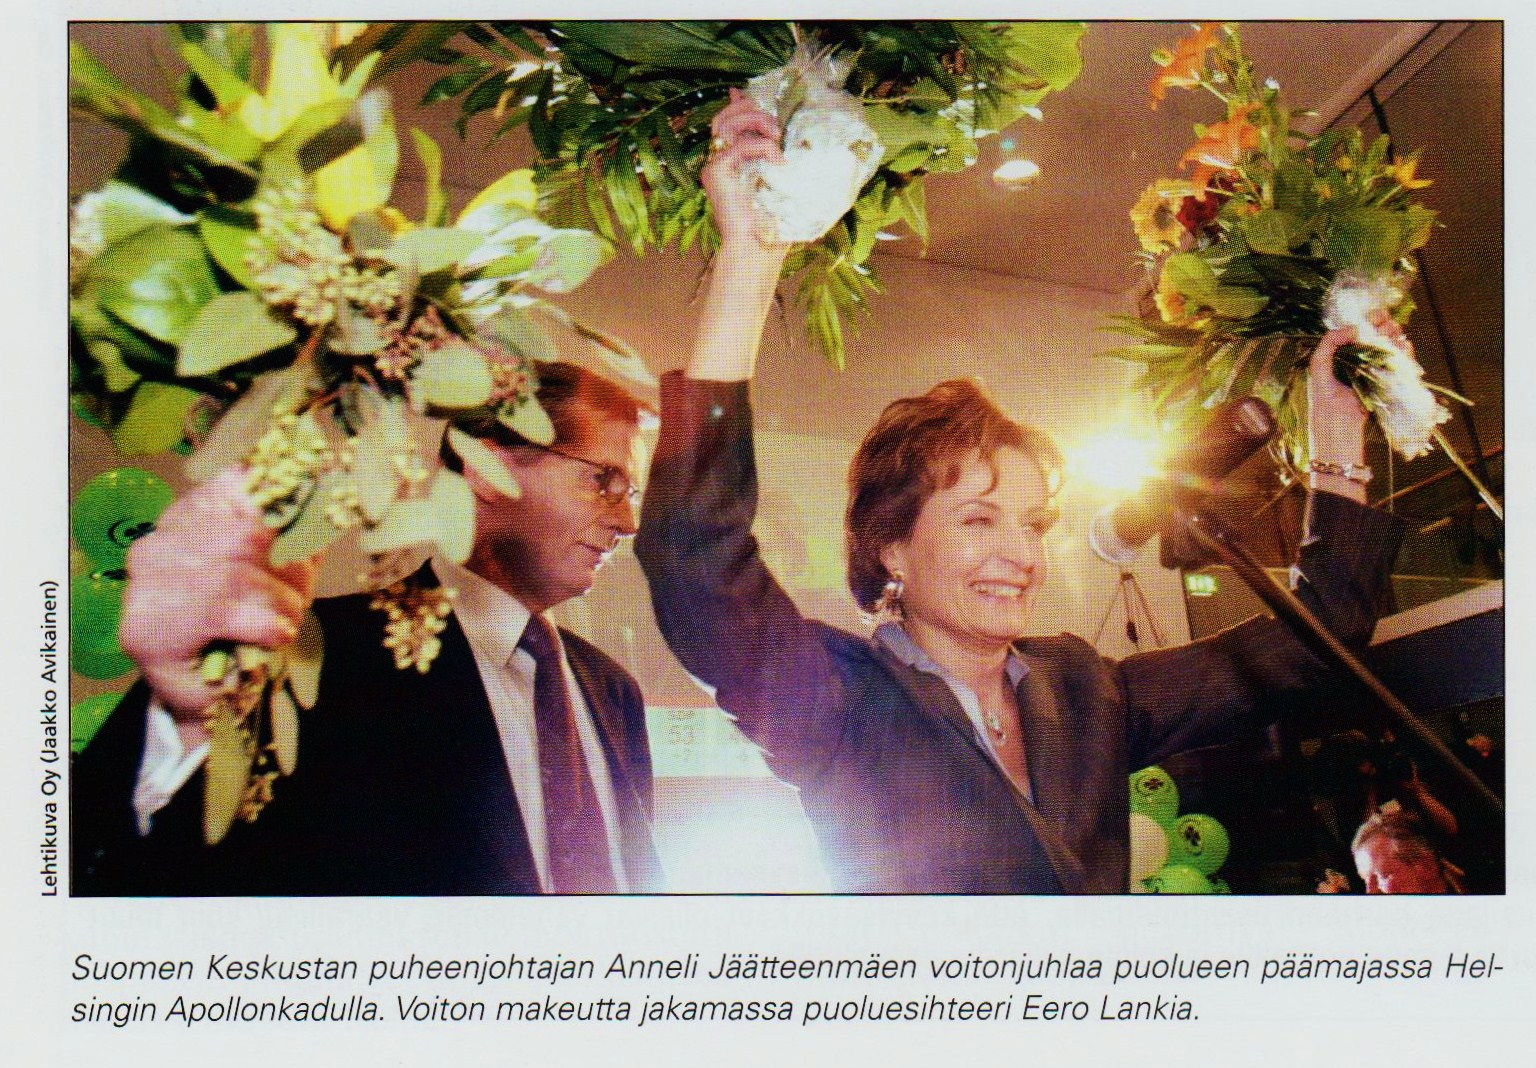 Uudempi Suomen historia  lokakuuta 2012 56e26642a9